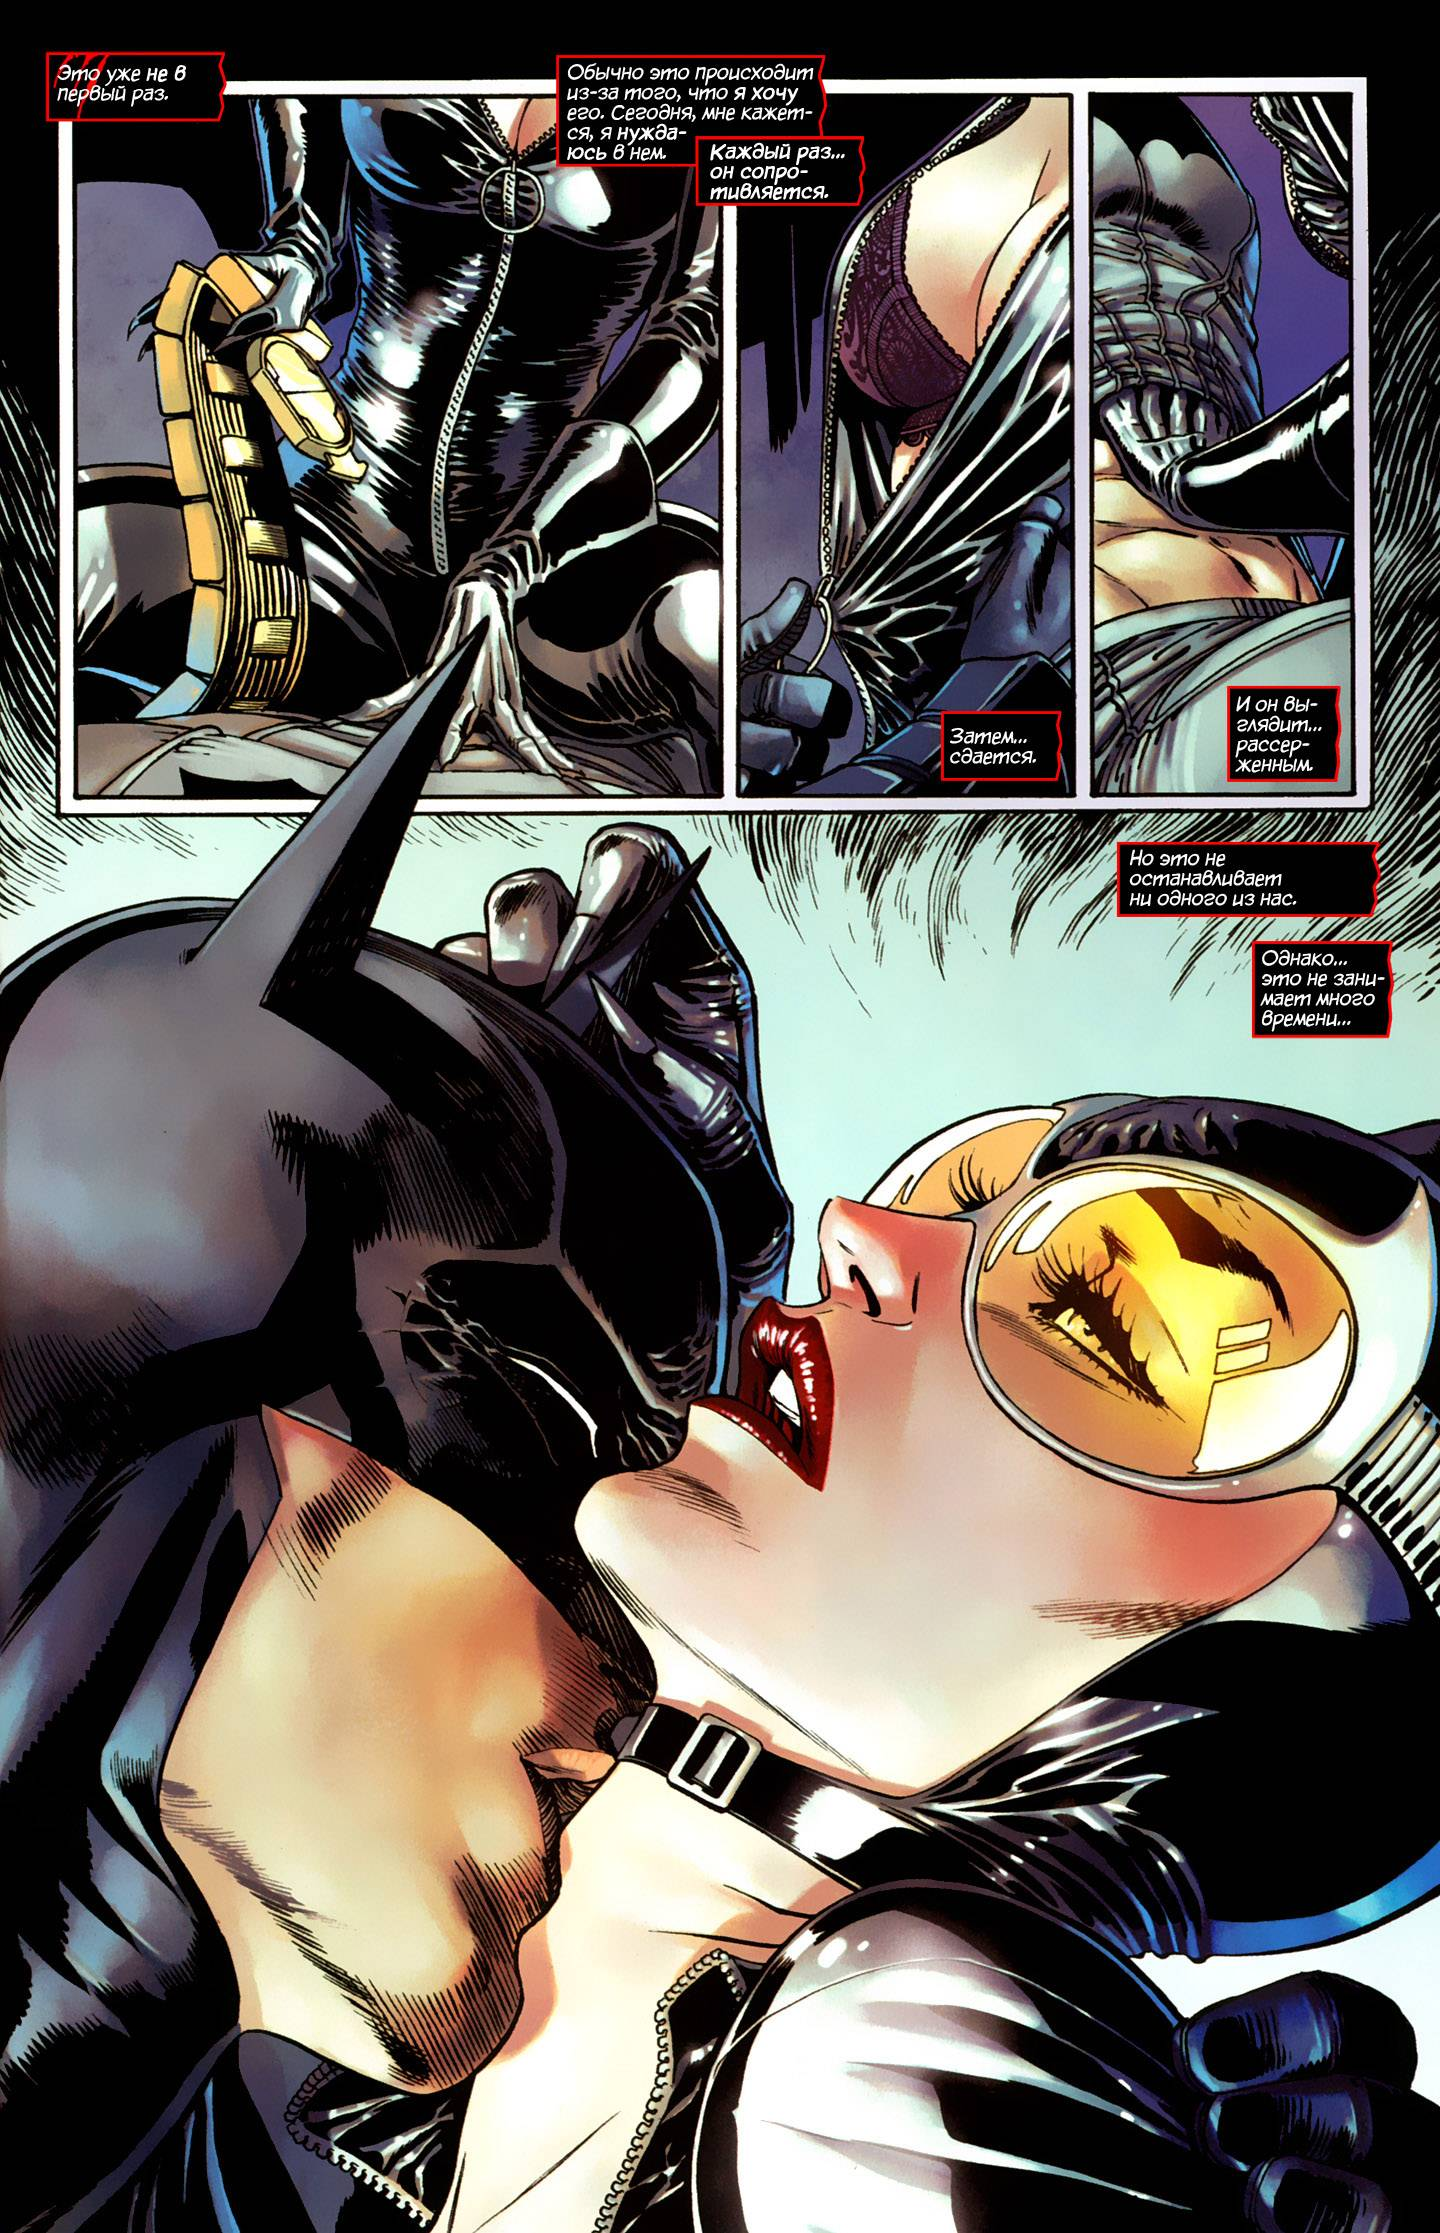 Naked catwoman lick batgirl boob pron girls